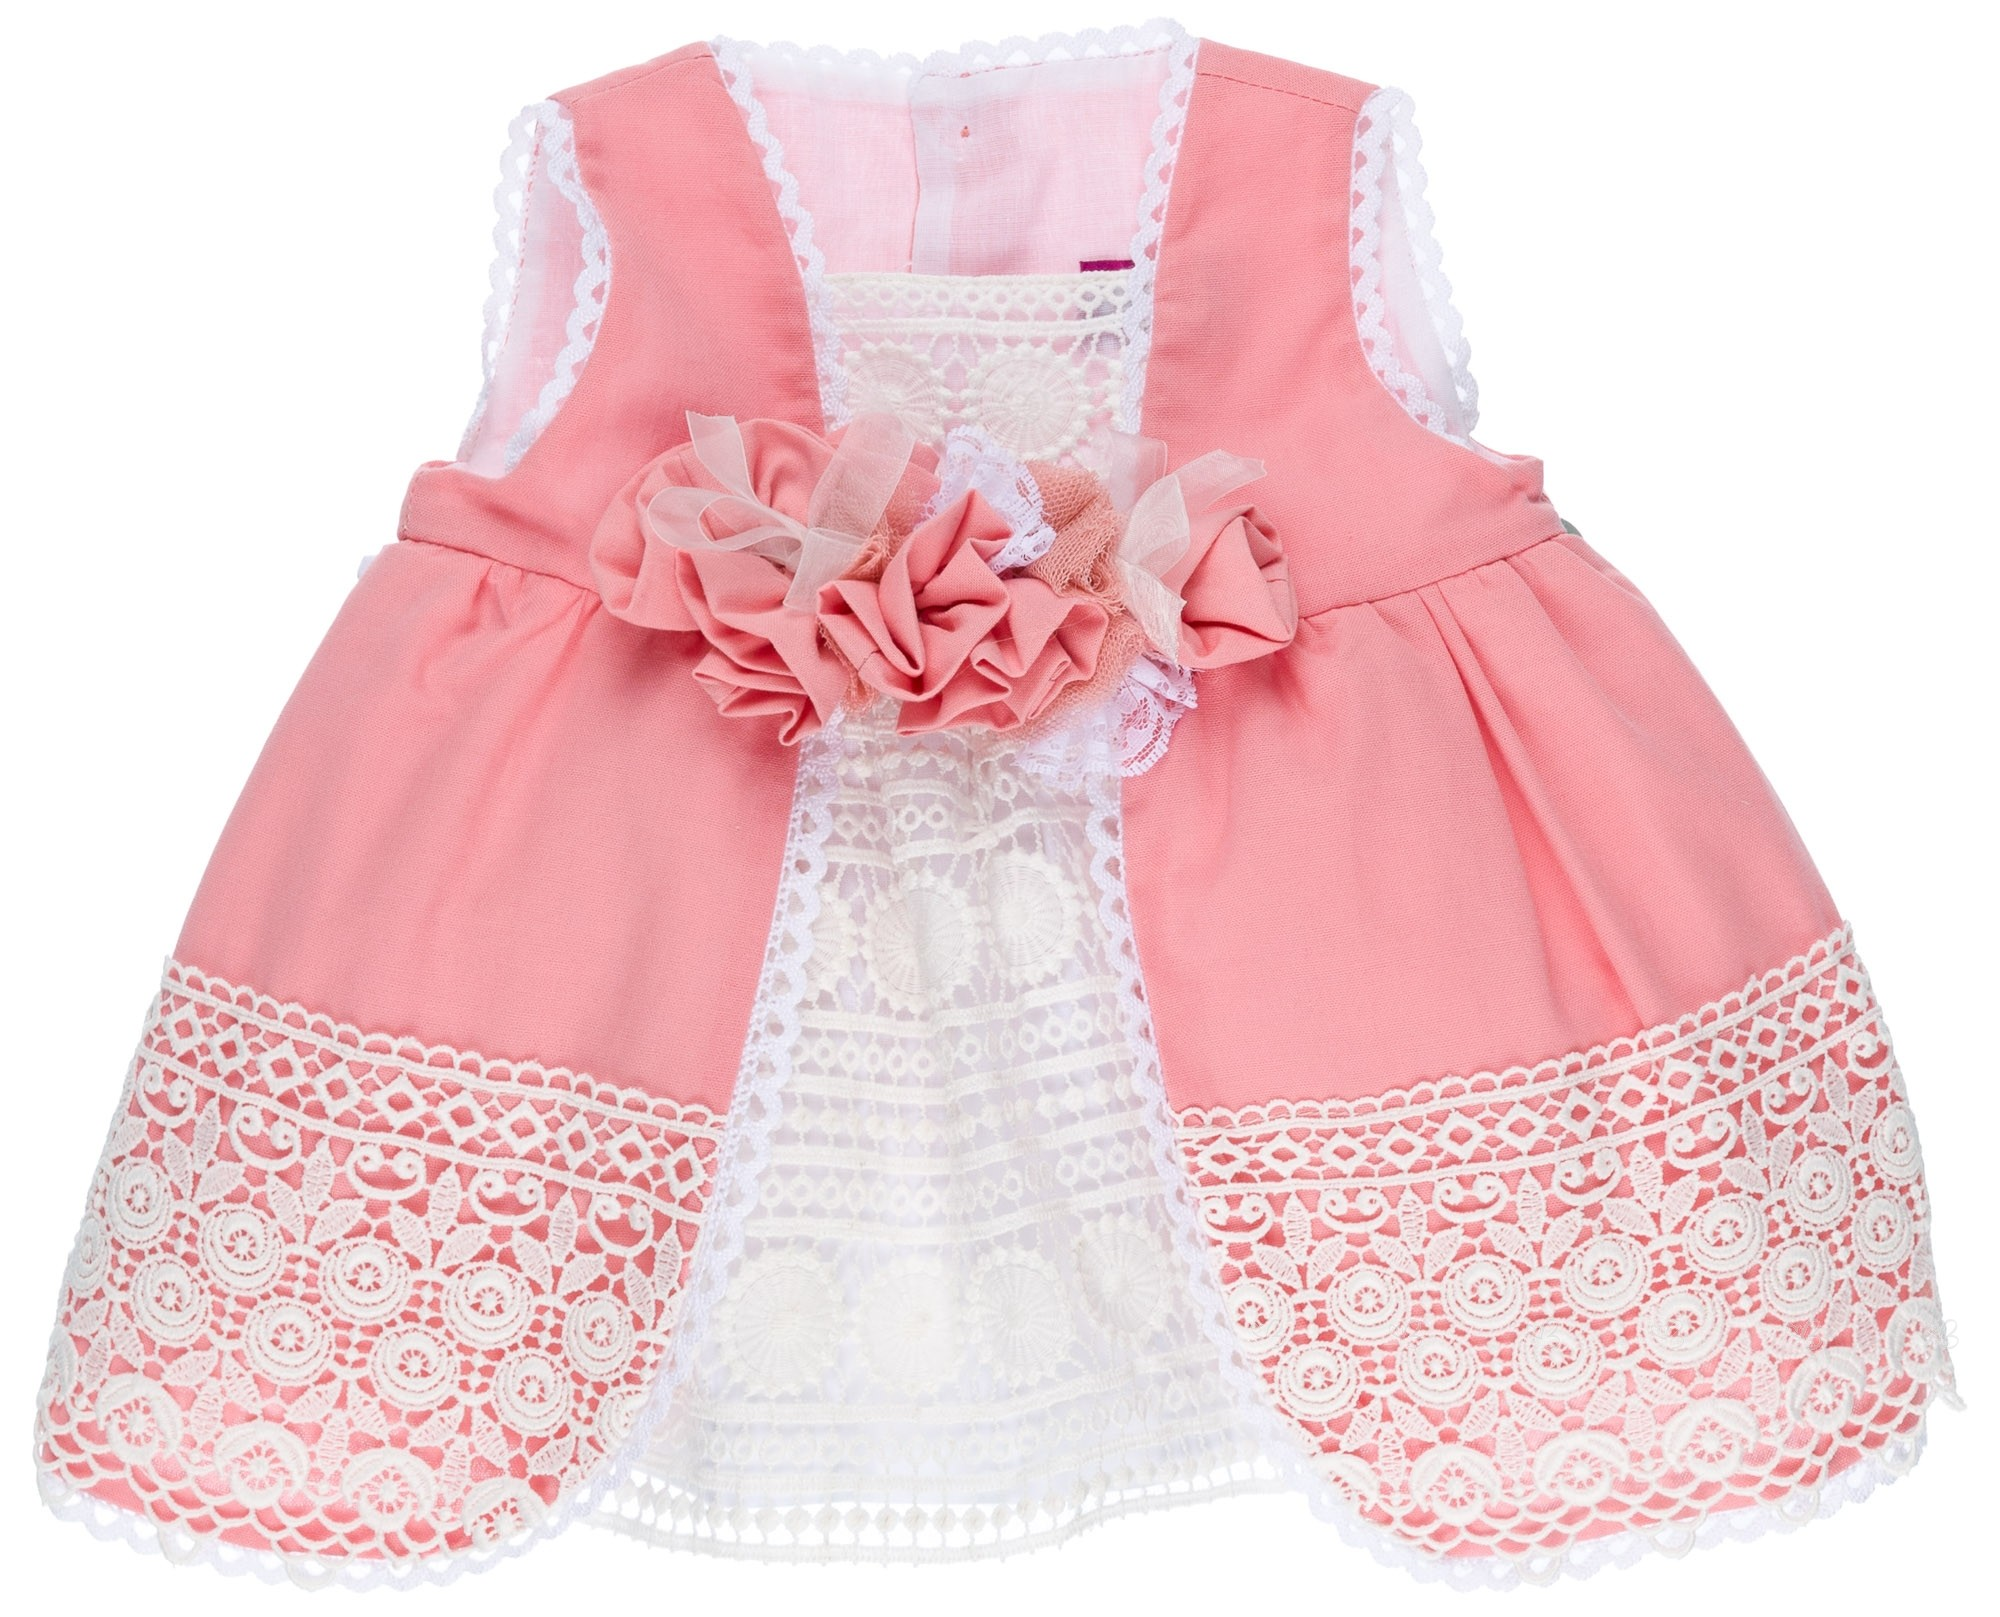 ab2b437c4 Baby Girls Pink & White Broderie 2 Piece Dress Set